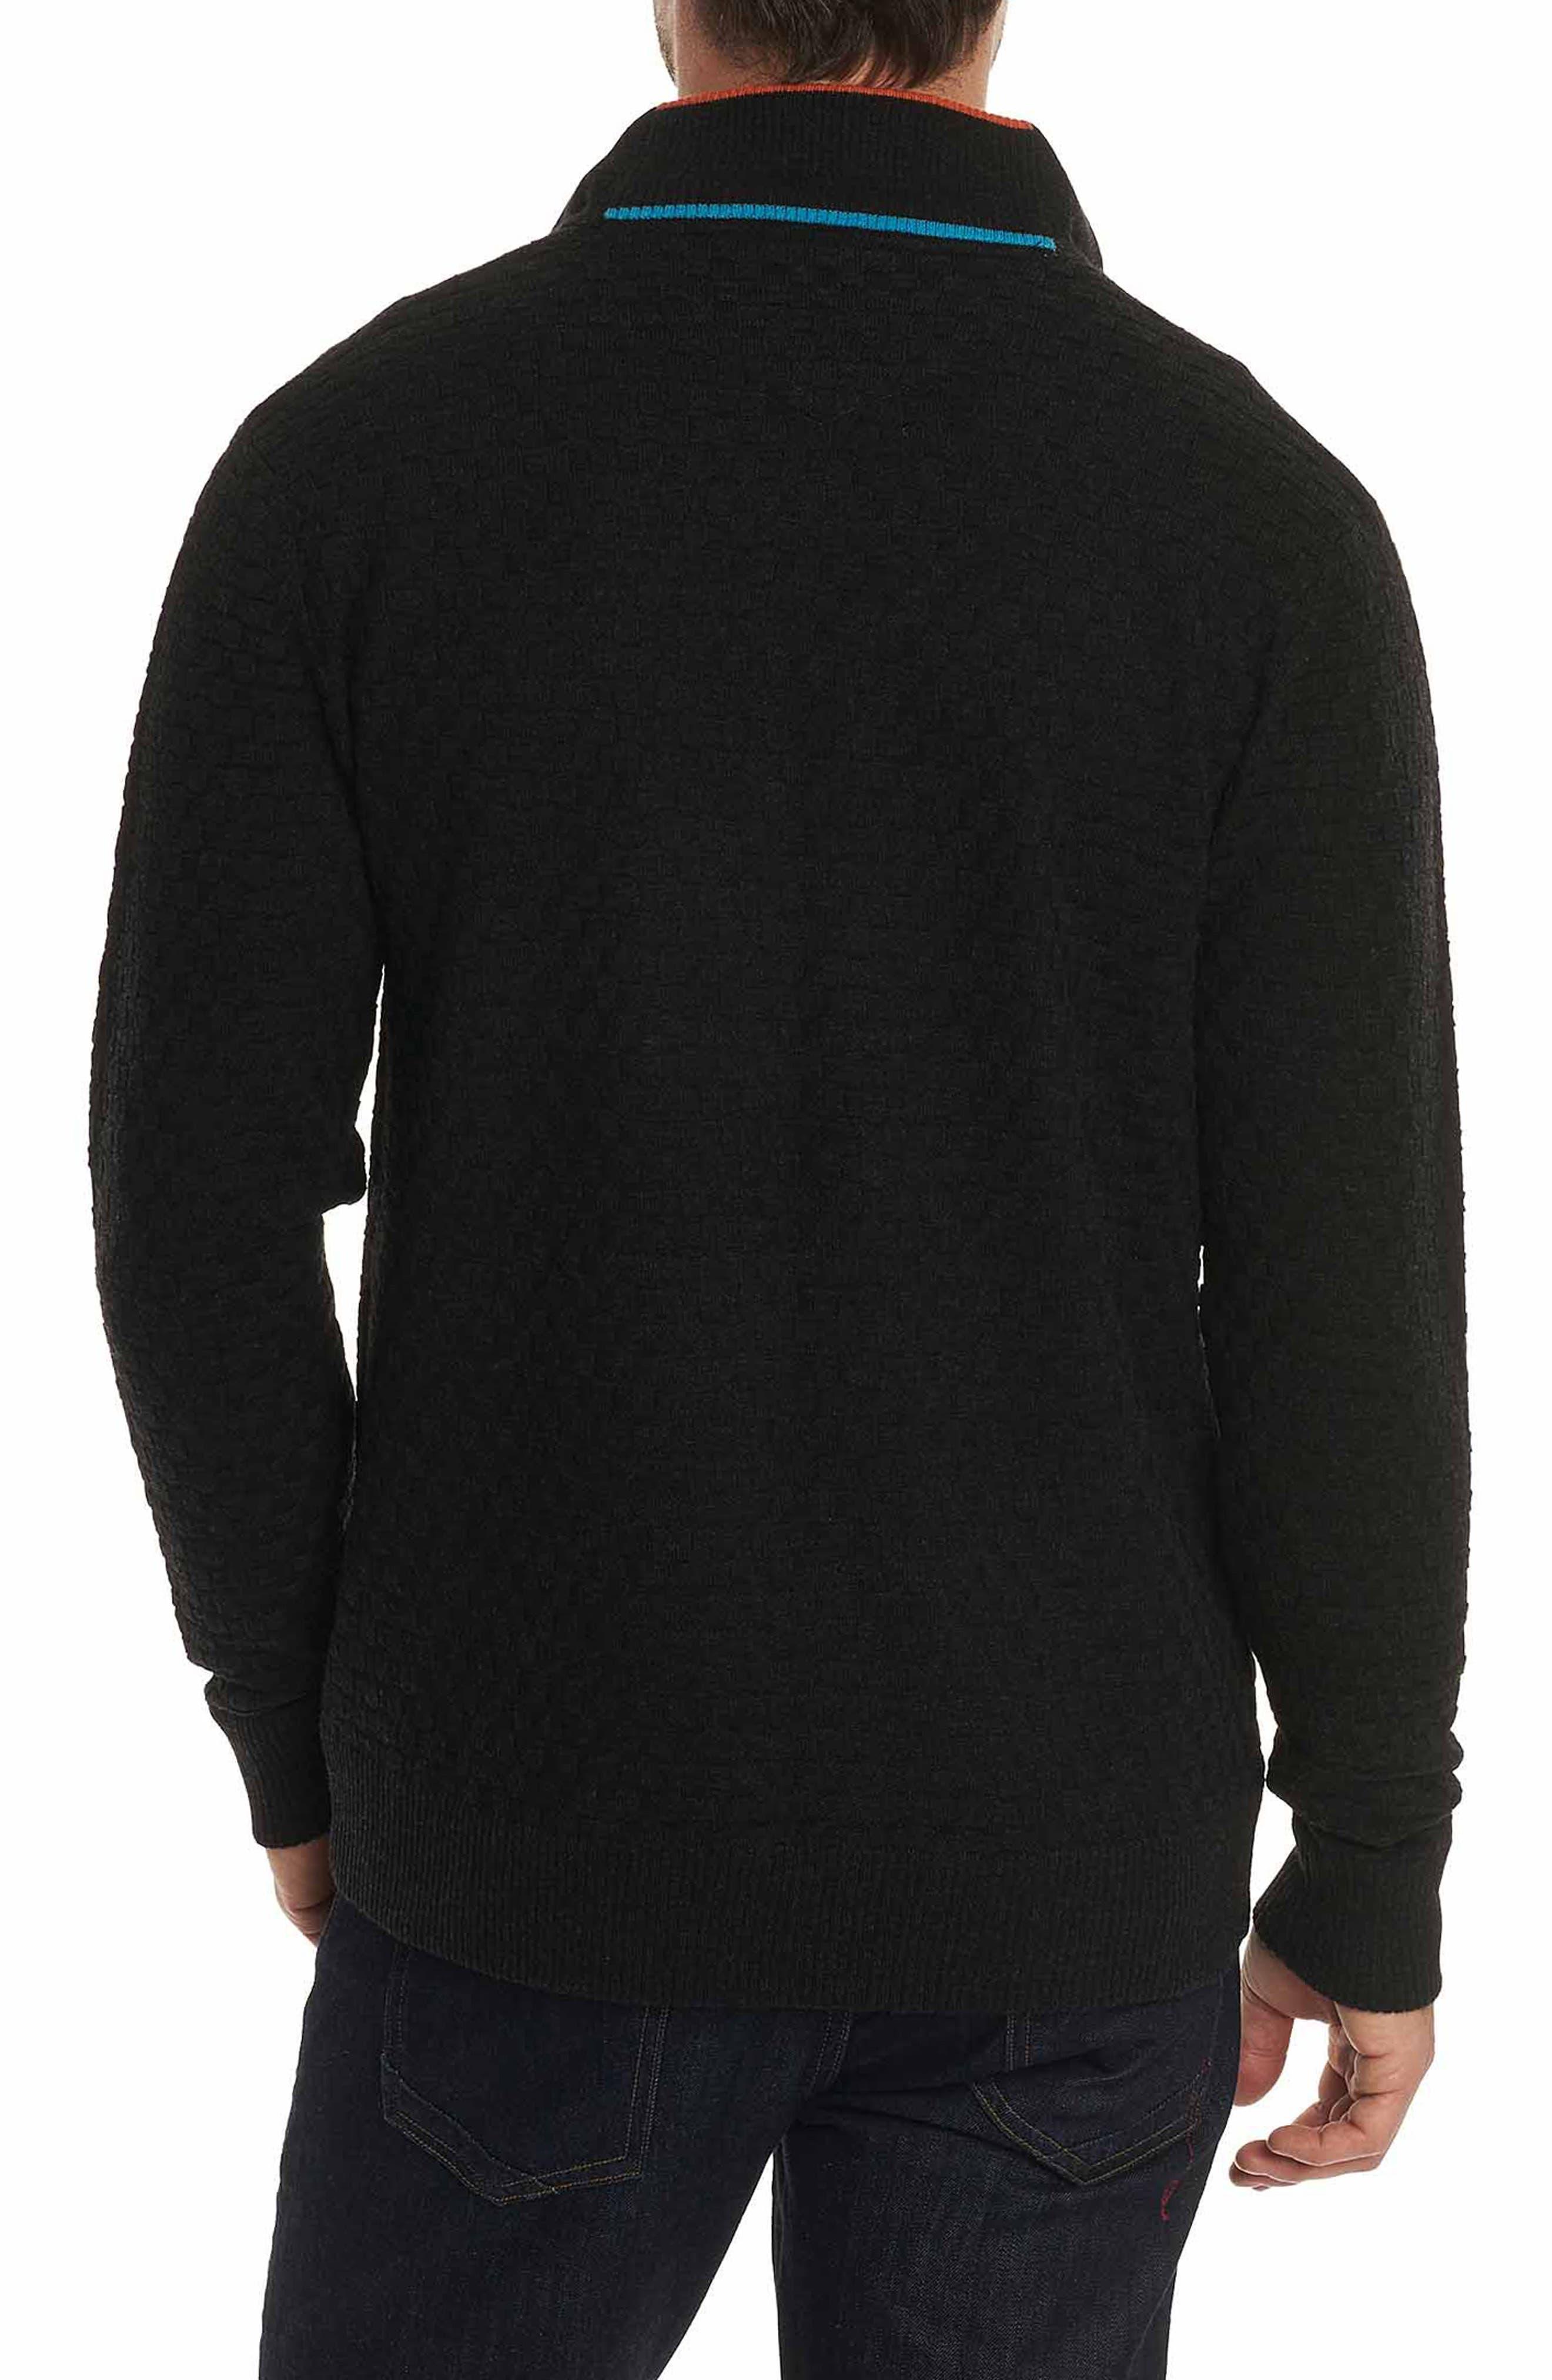 American Beech Wool Sweater,                             Alternate thumbnail 2, color,                             001